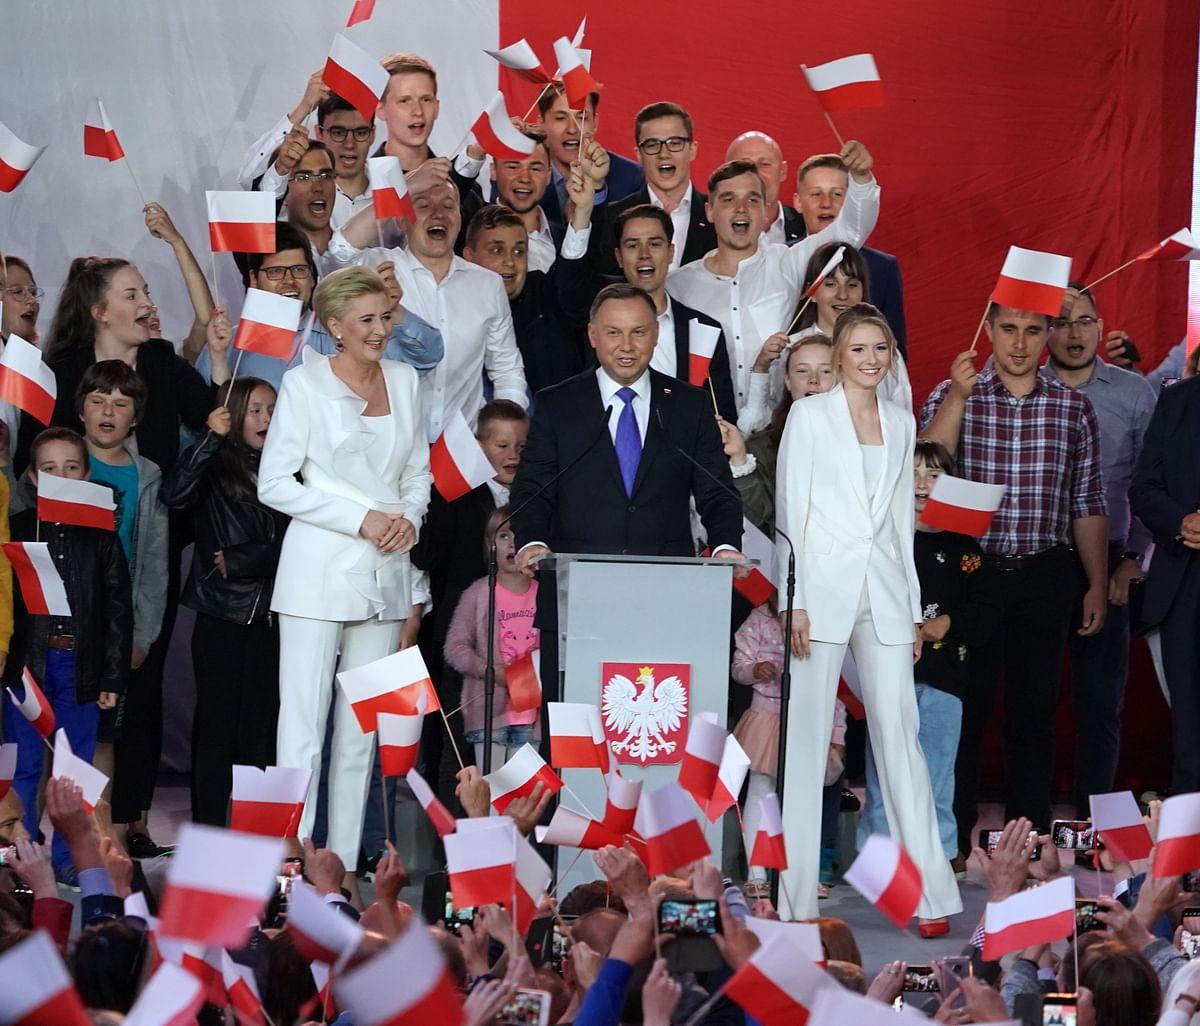 Polish President wins second term